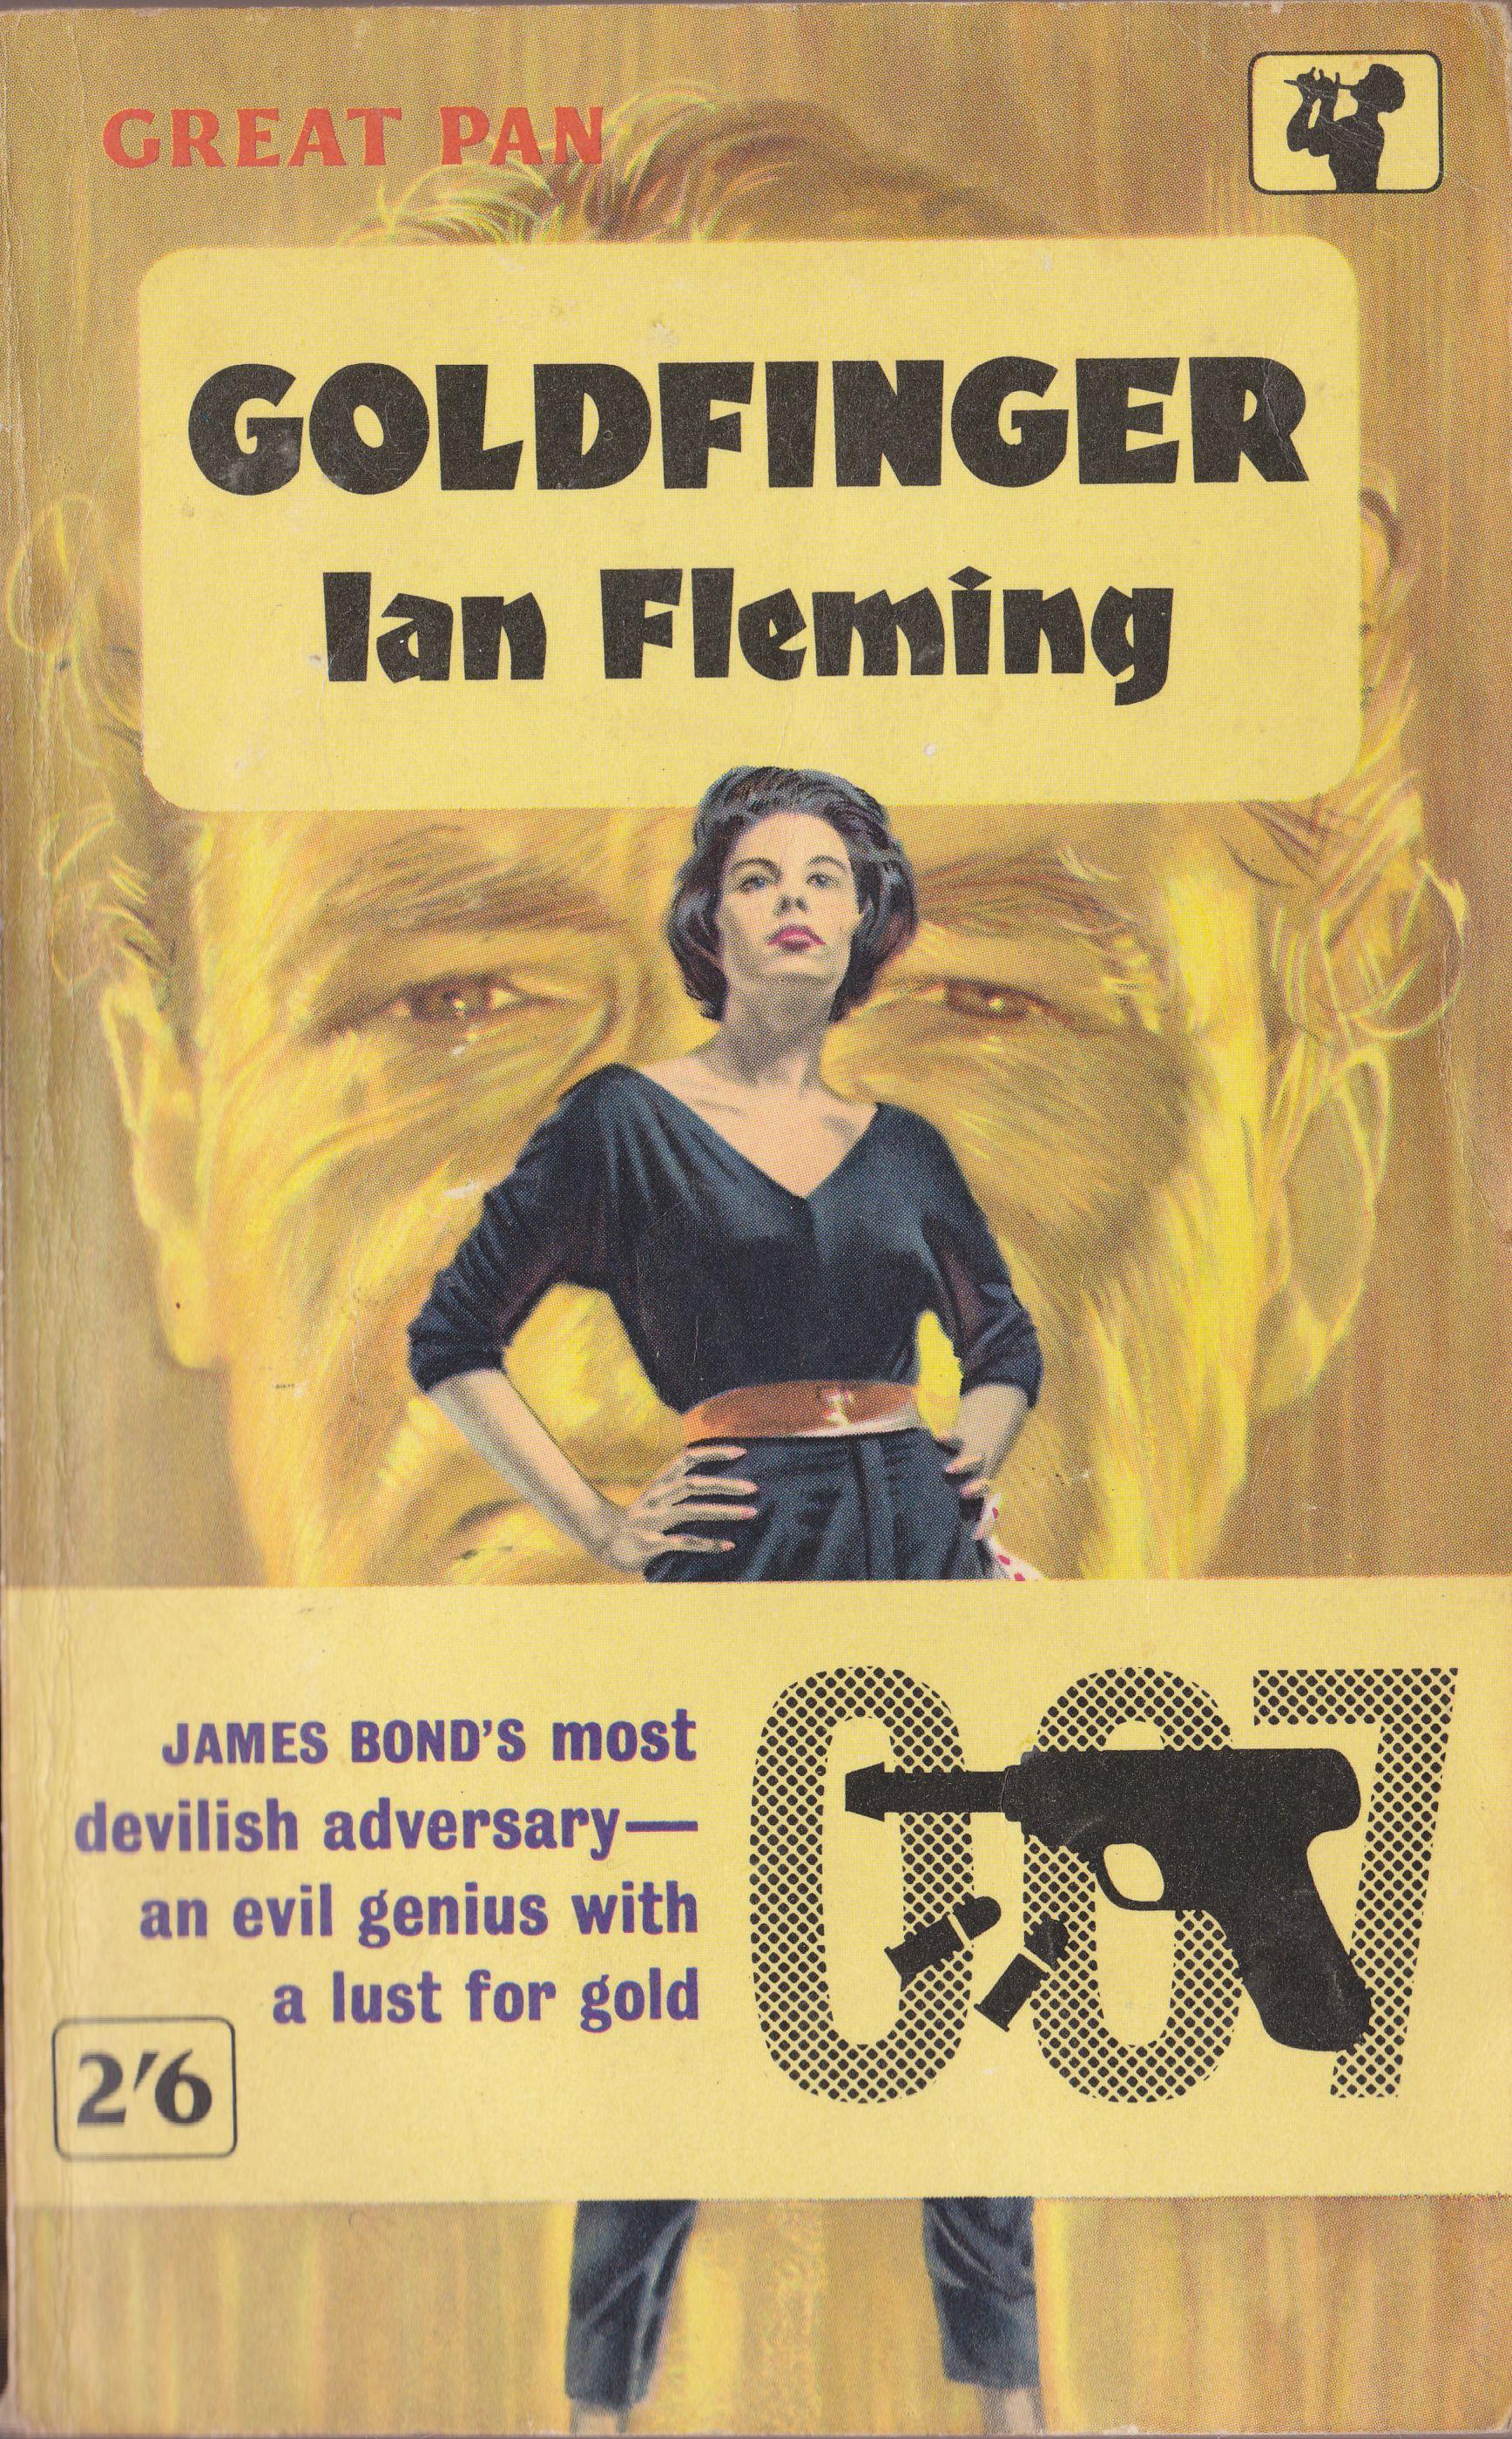 James Bond Book Cover Art : Ian fleming goldfinger great pan paperback